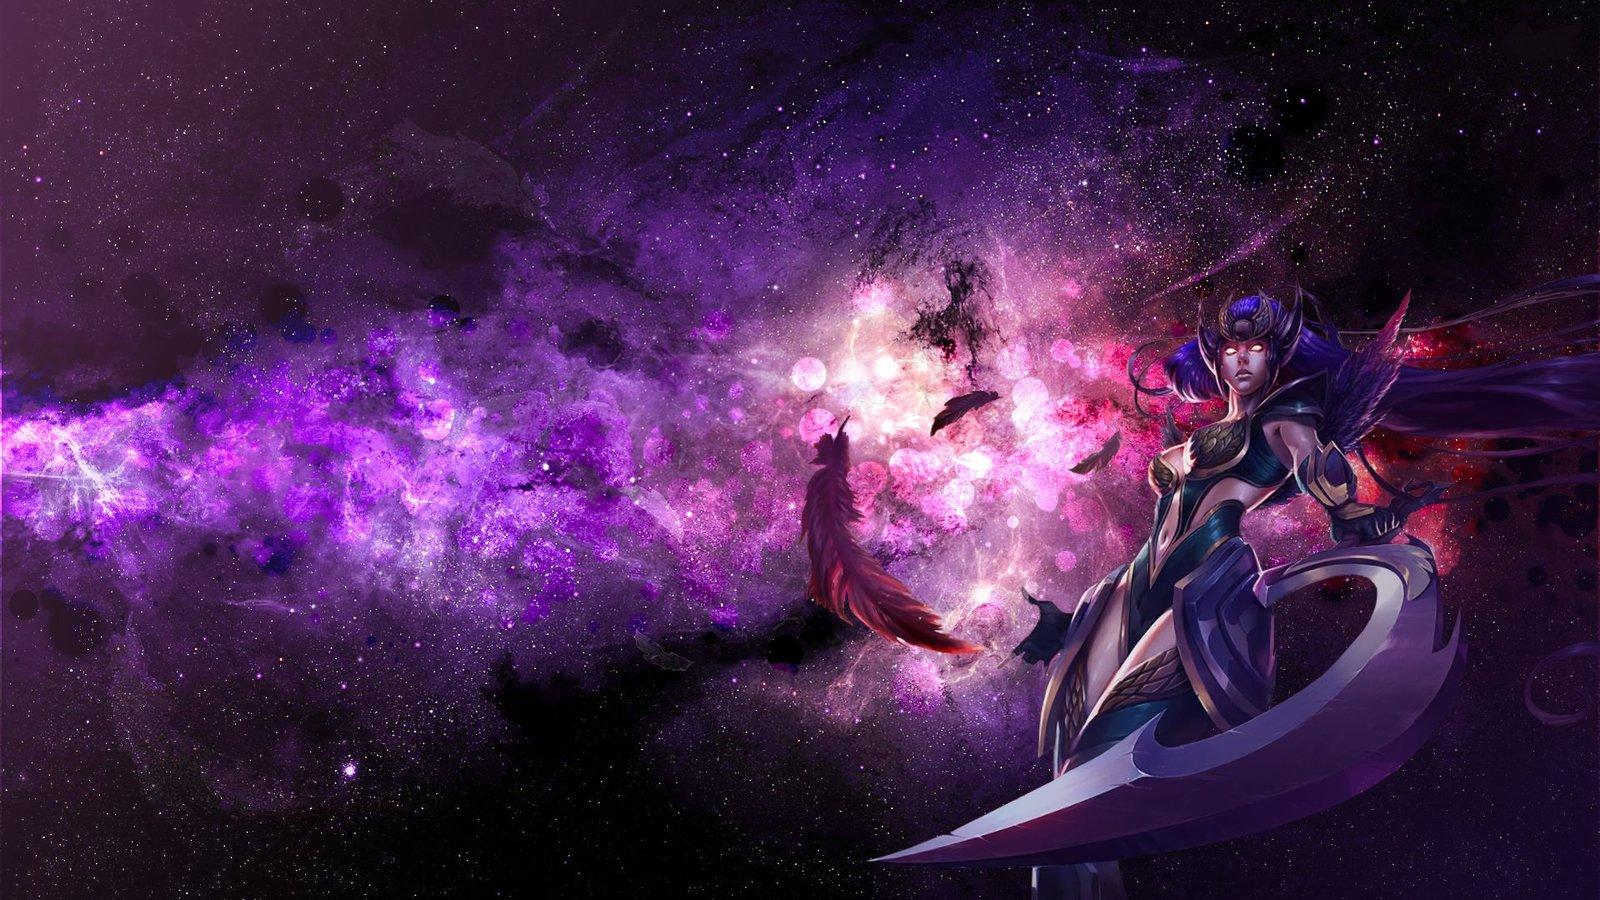 Dark Valkyrie Diana Wallpapers Fan Arts League Of Legends